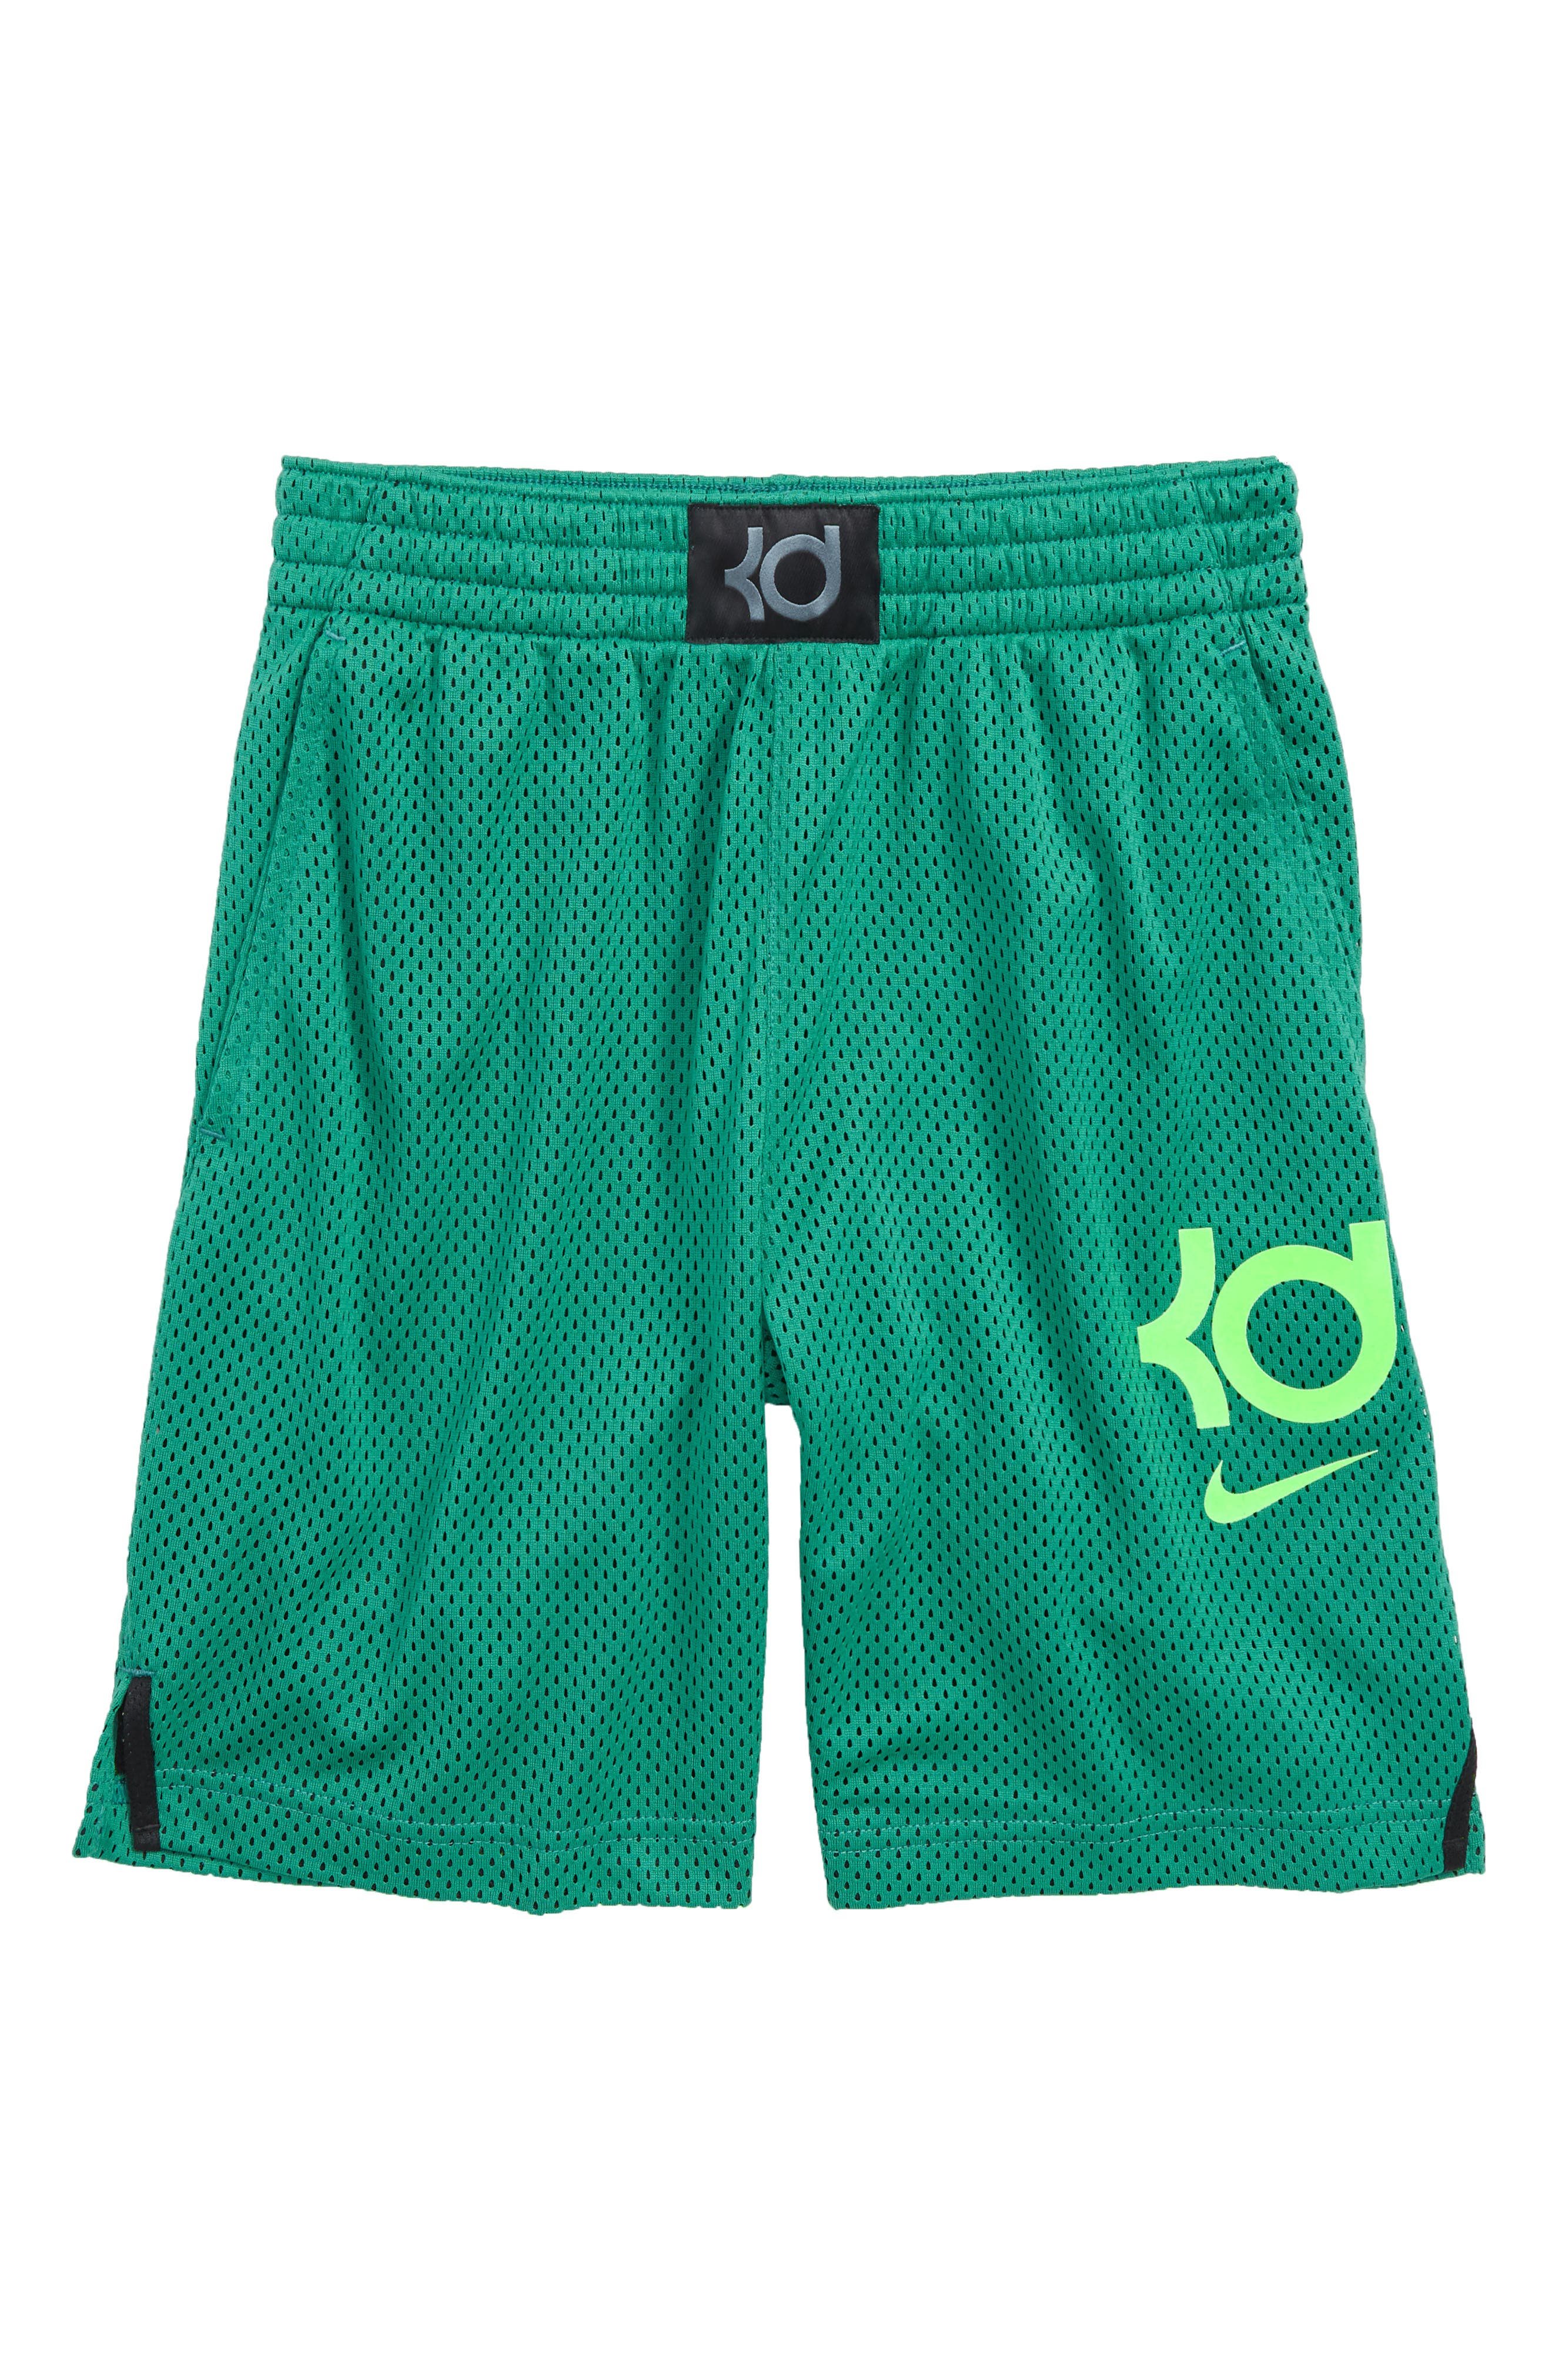 KD GFX Shorts,                         Main,                         color, Green Noise/ Green Strike